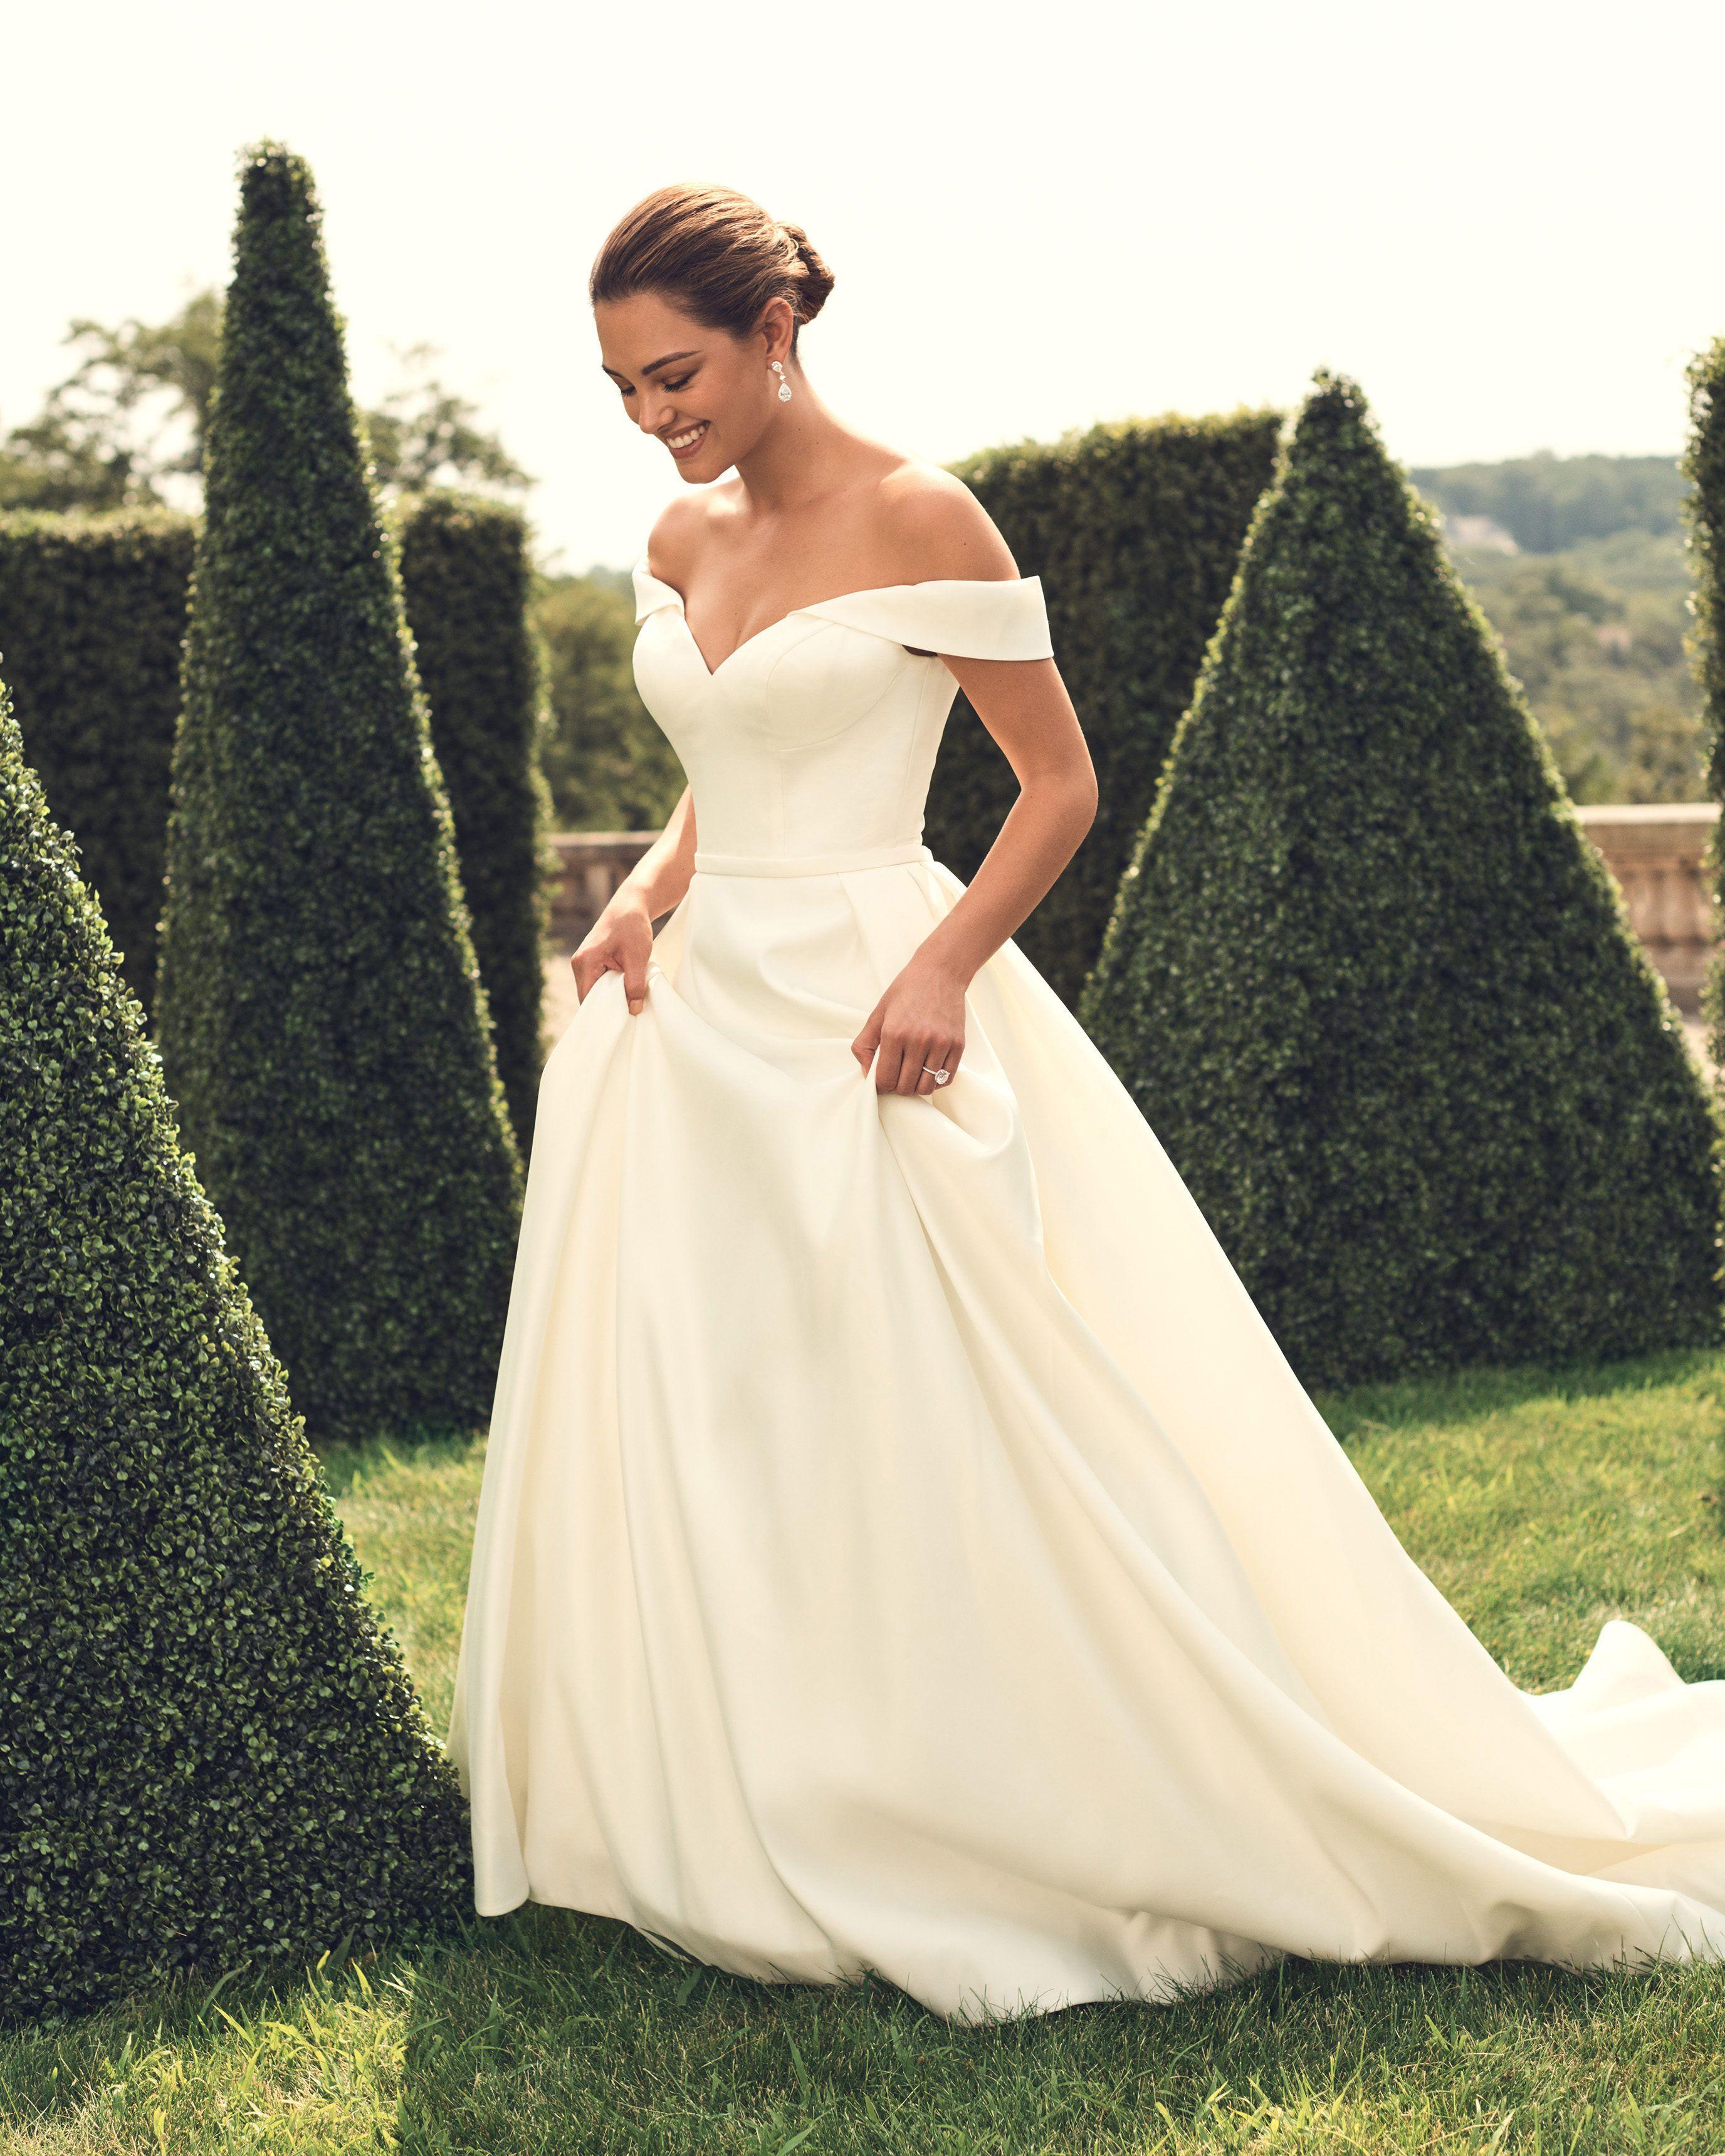 Off The Shoulder Satin Ball Gown Wedding Dress David S Bridal Ball Gowns Wedding Davids Bridal Wedding Dresses Ball Gown Wedding Dress [ 3440 x 2752 Pixel ]